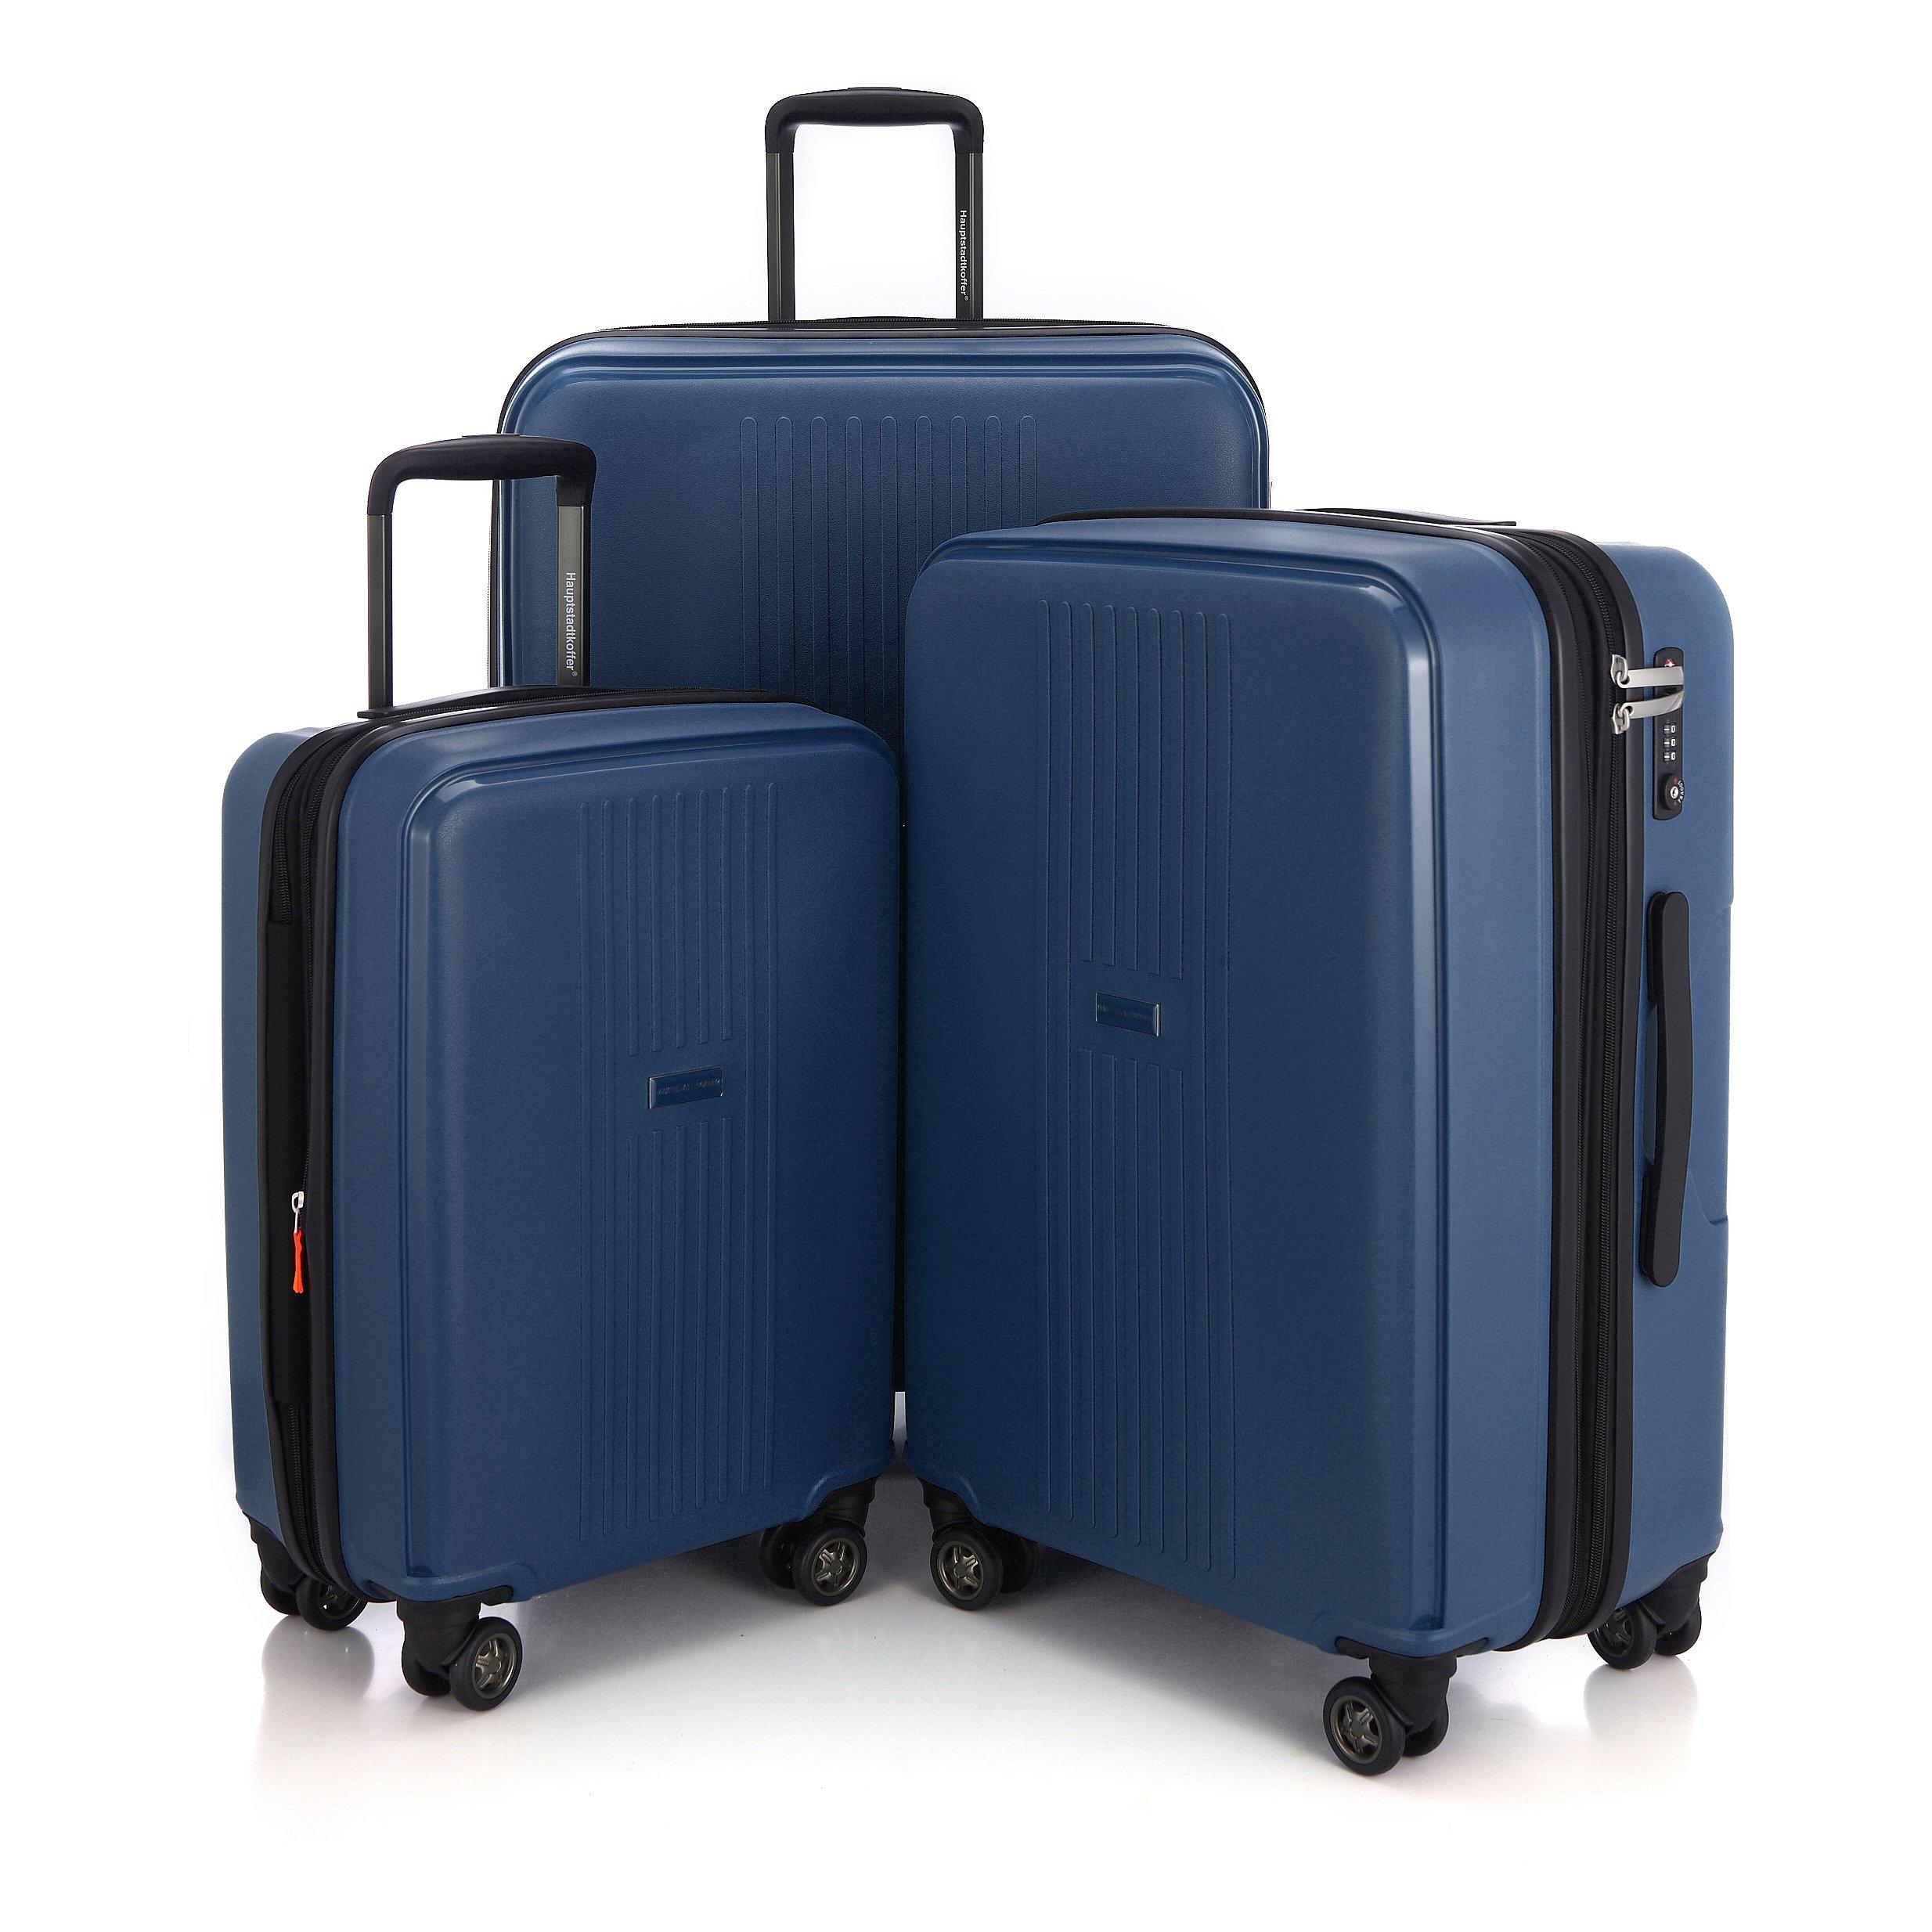 "HAUPTSTADTKOFFER - Ostkreuz - Set of 3 Hard-side Luggages matt Suitcase Hardside Spinner Trolley Expandable (20"", 24"" & 28"") TSA F-Darkblue"